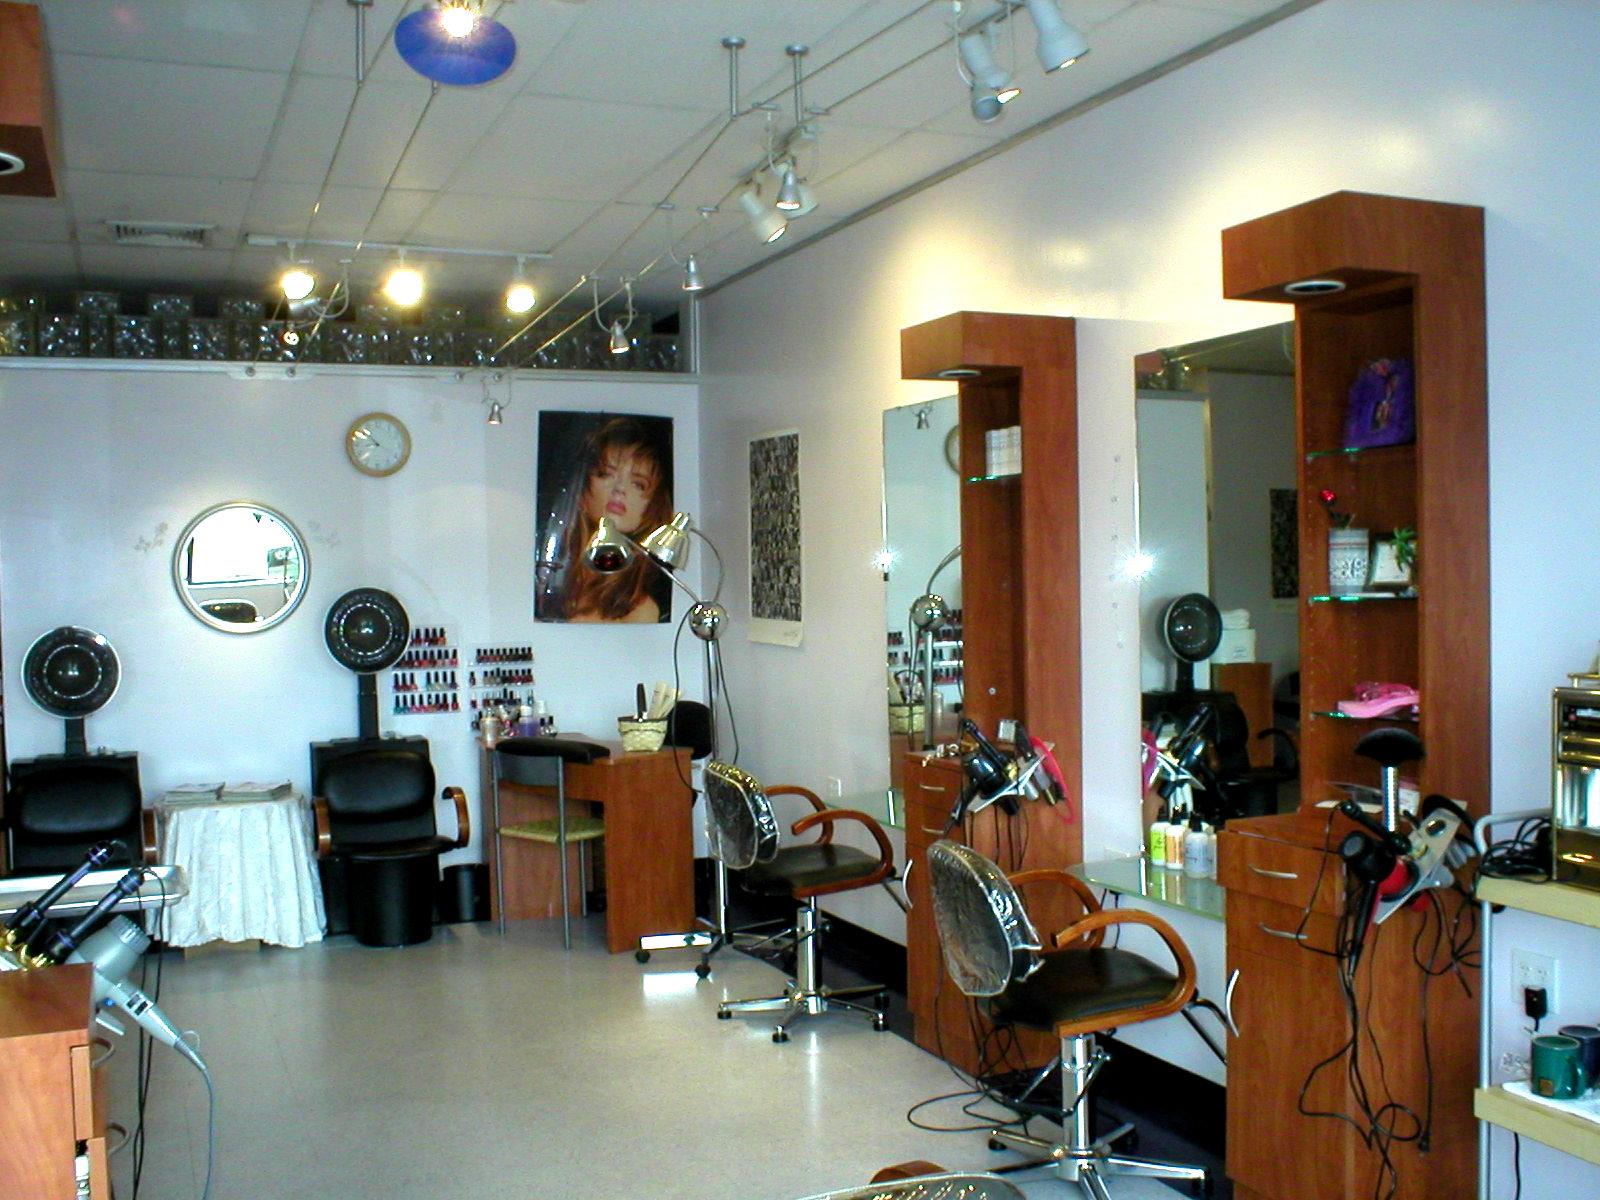 Hair Salon Day Spa Wallingford Connecticut Chameleon Hair Salon